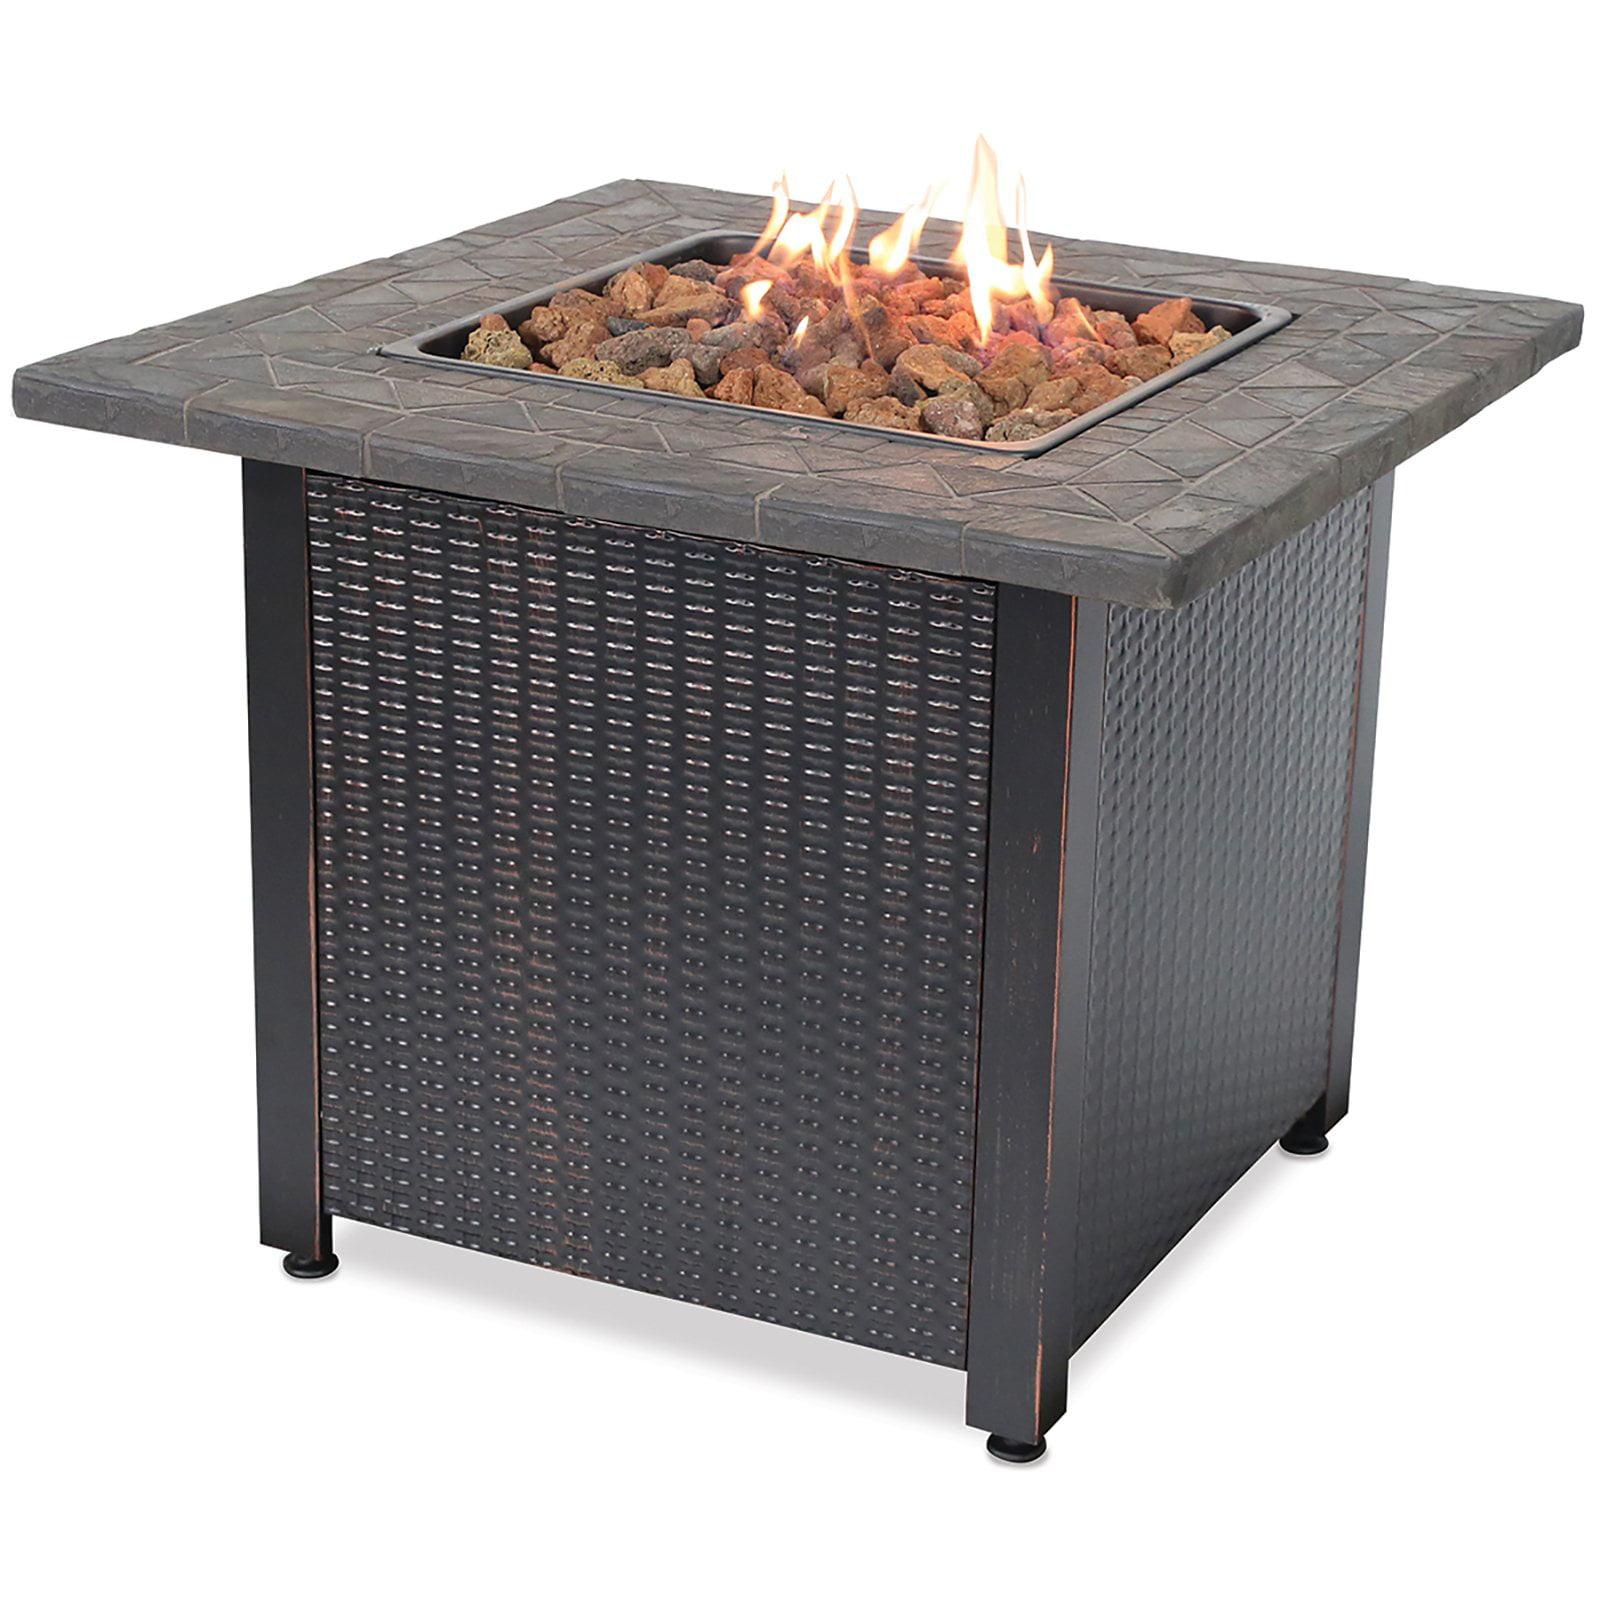 Blue Rhino LP Gas Outdoor Fireplace by Blue Rhino